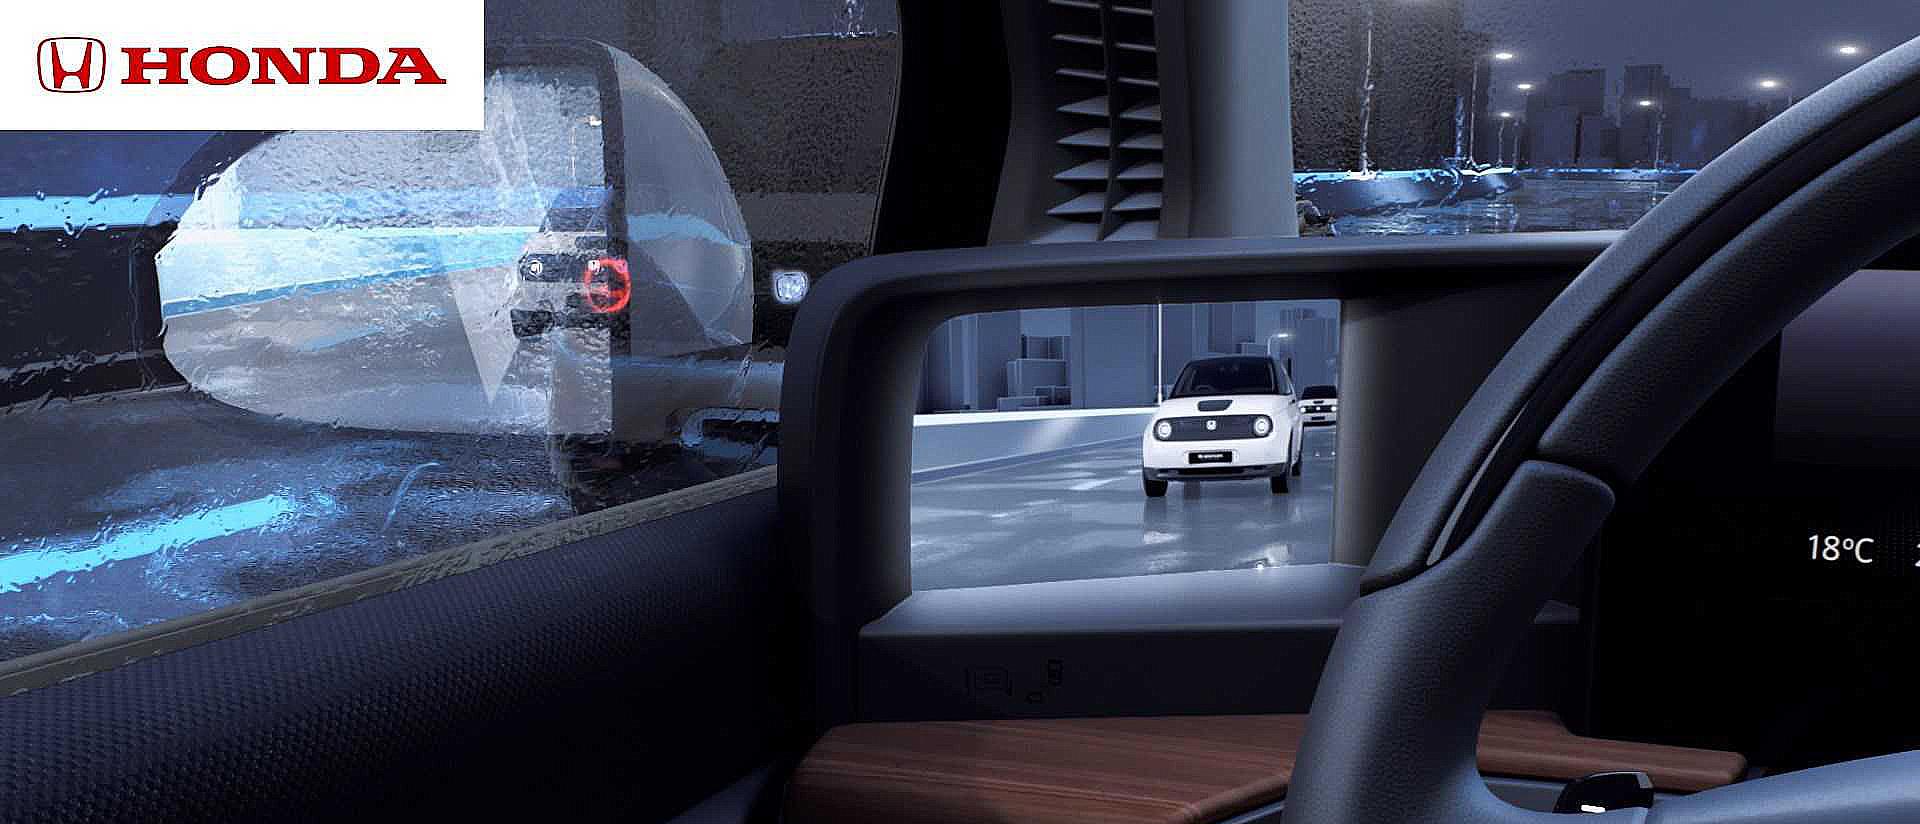 Honda E Side Camera Mirror System 11